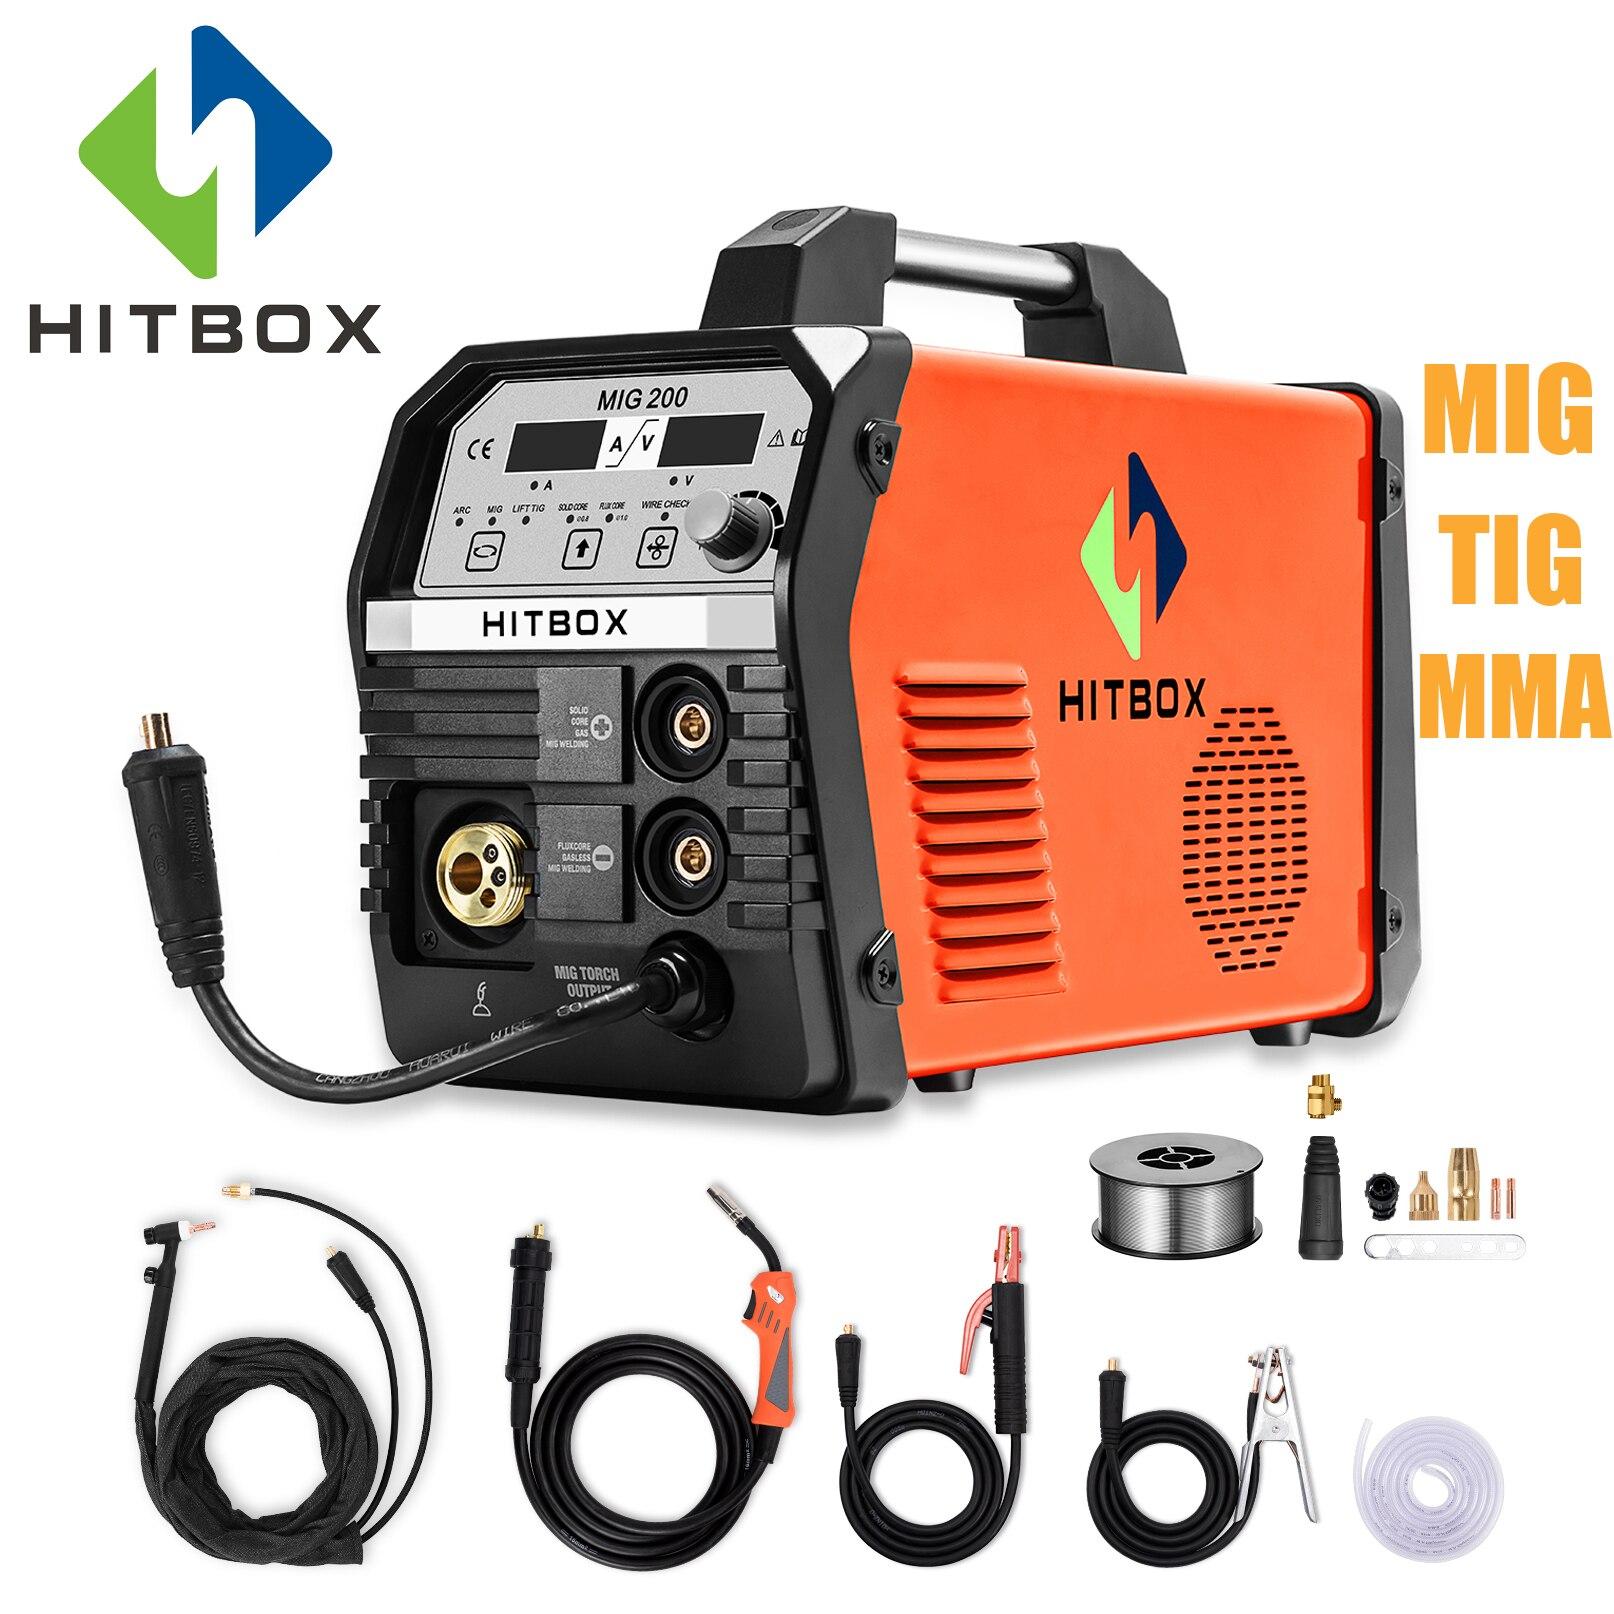 HITBOX Mig Welder New Appearance MIG200 Functional DC Gas No Gas Self-Shielded MIG 4.0mm ARC Welder MIG LIFT TIG MMA 220V